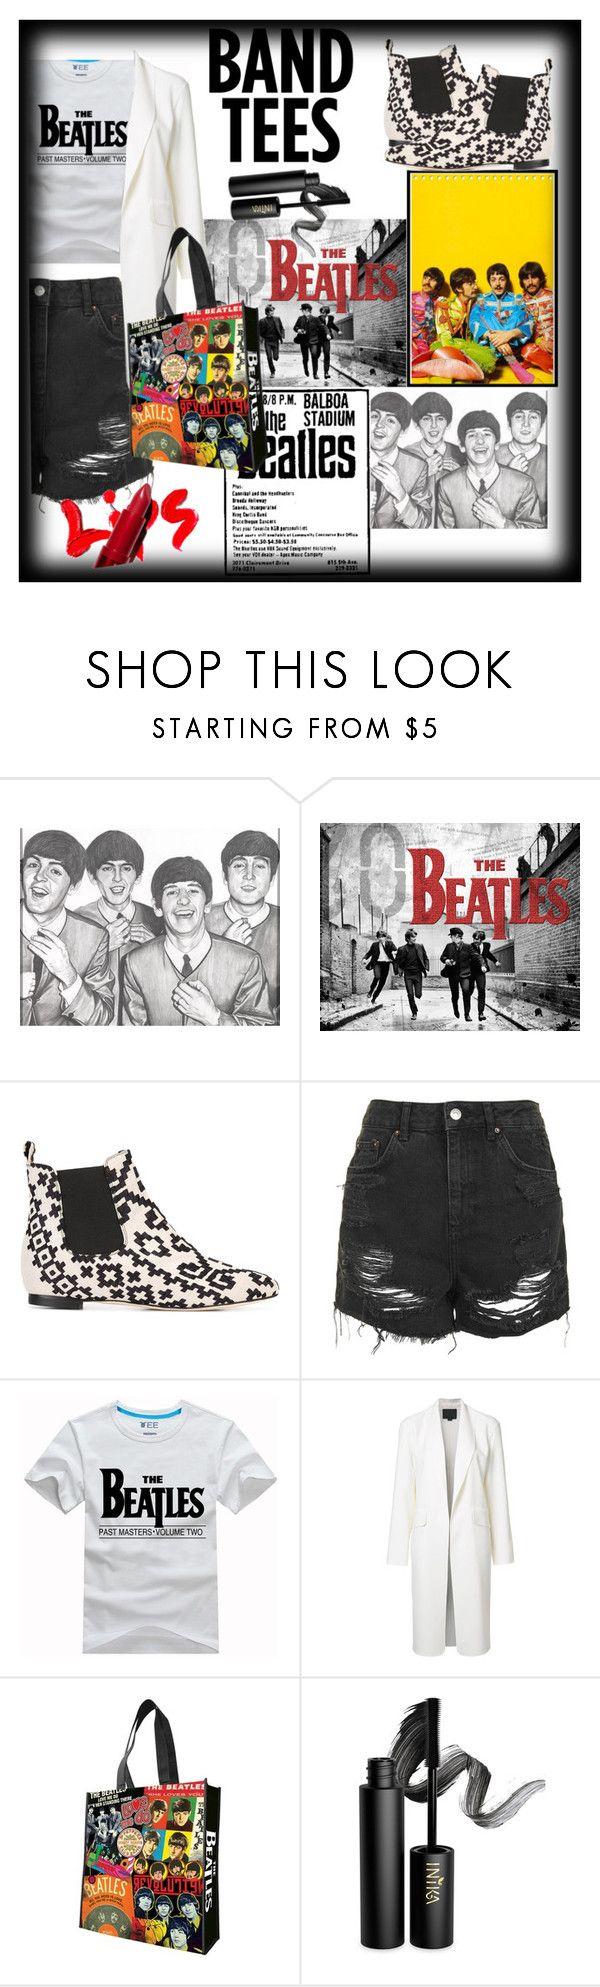 """Beatles: Band tees"" by debbie-riley ❤ liked on Polyvore featuring Bams, Topshop, Alexander Wang, Vandor and INIKA"